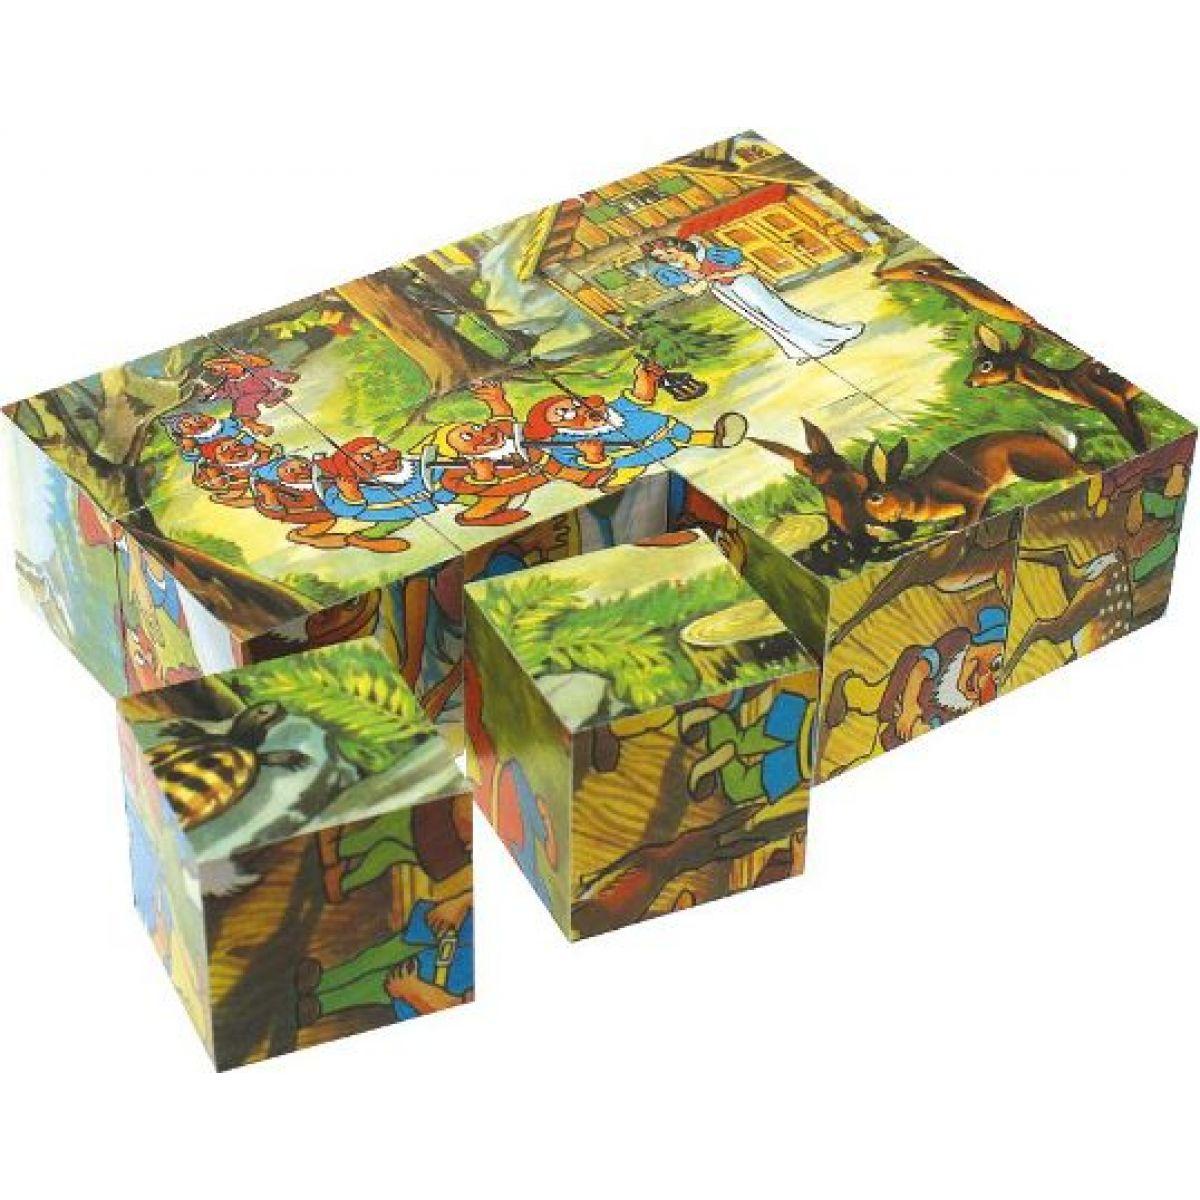 Topa kocky Snehulienka v krabičke